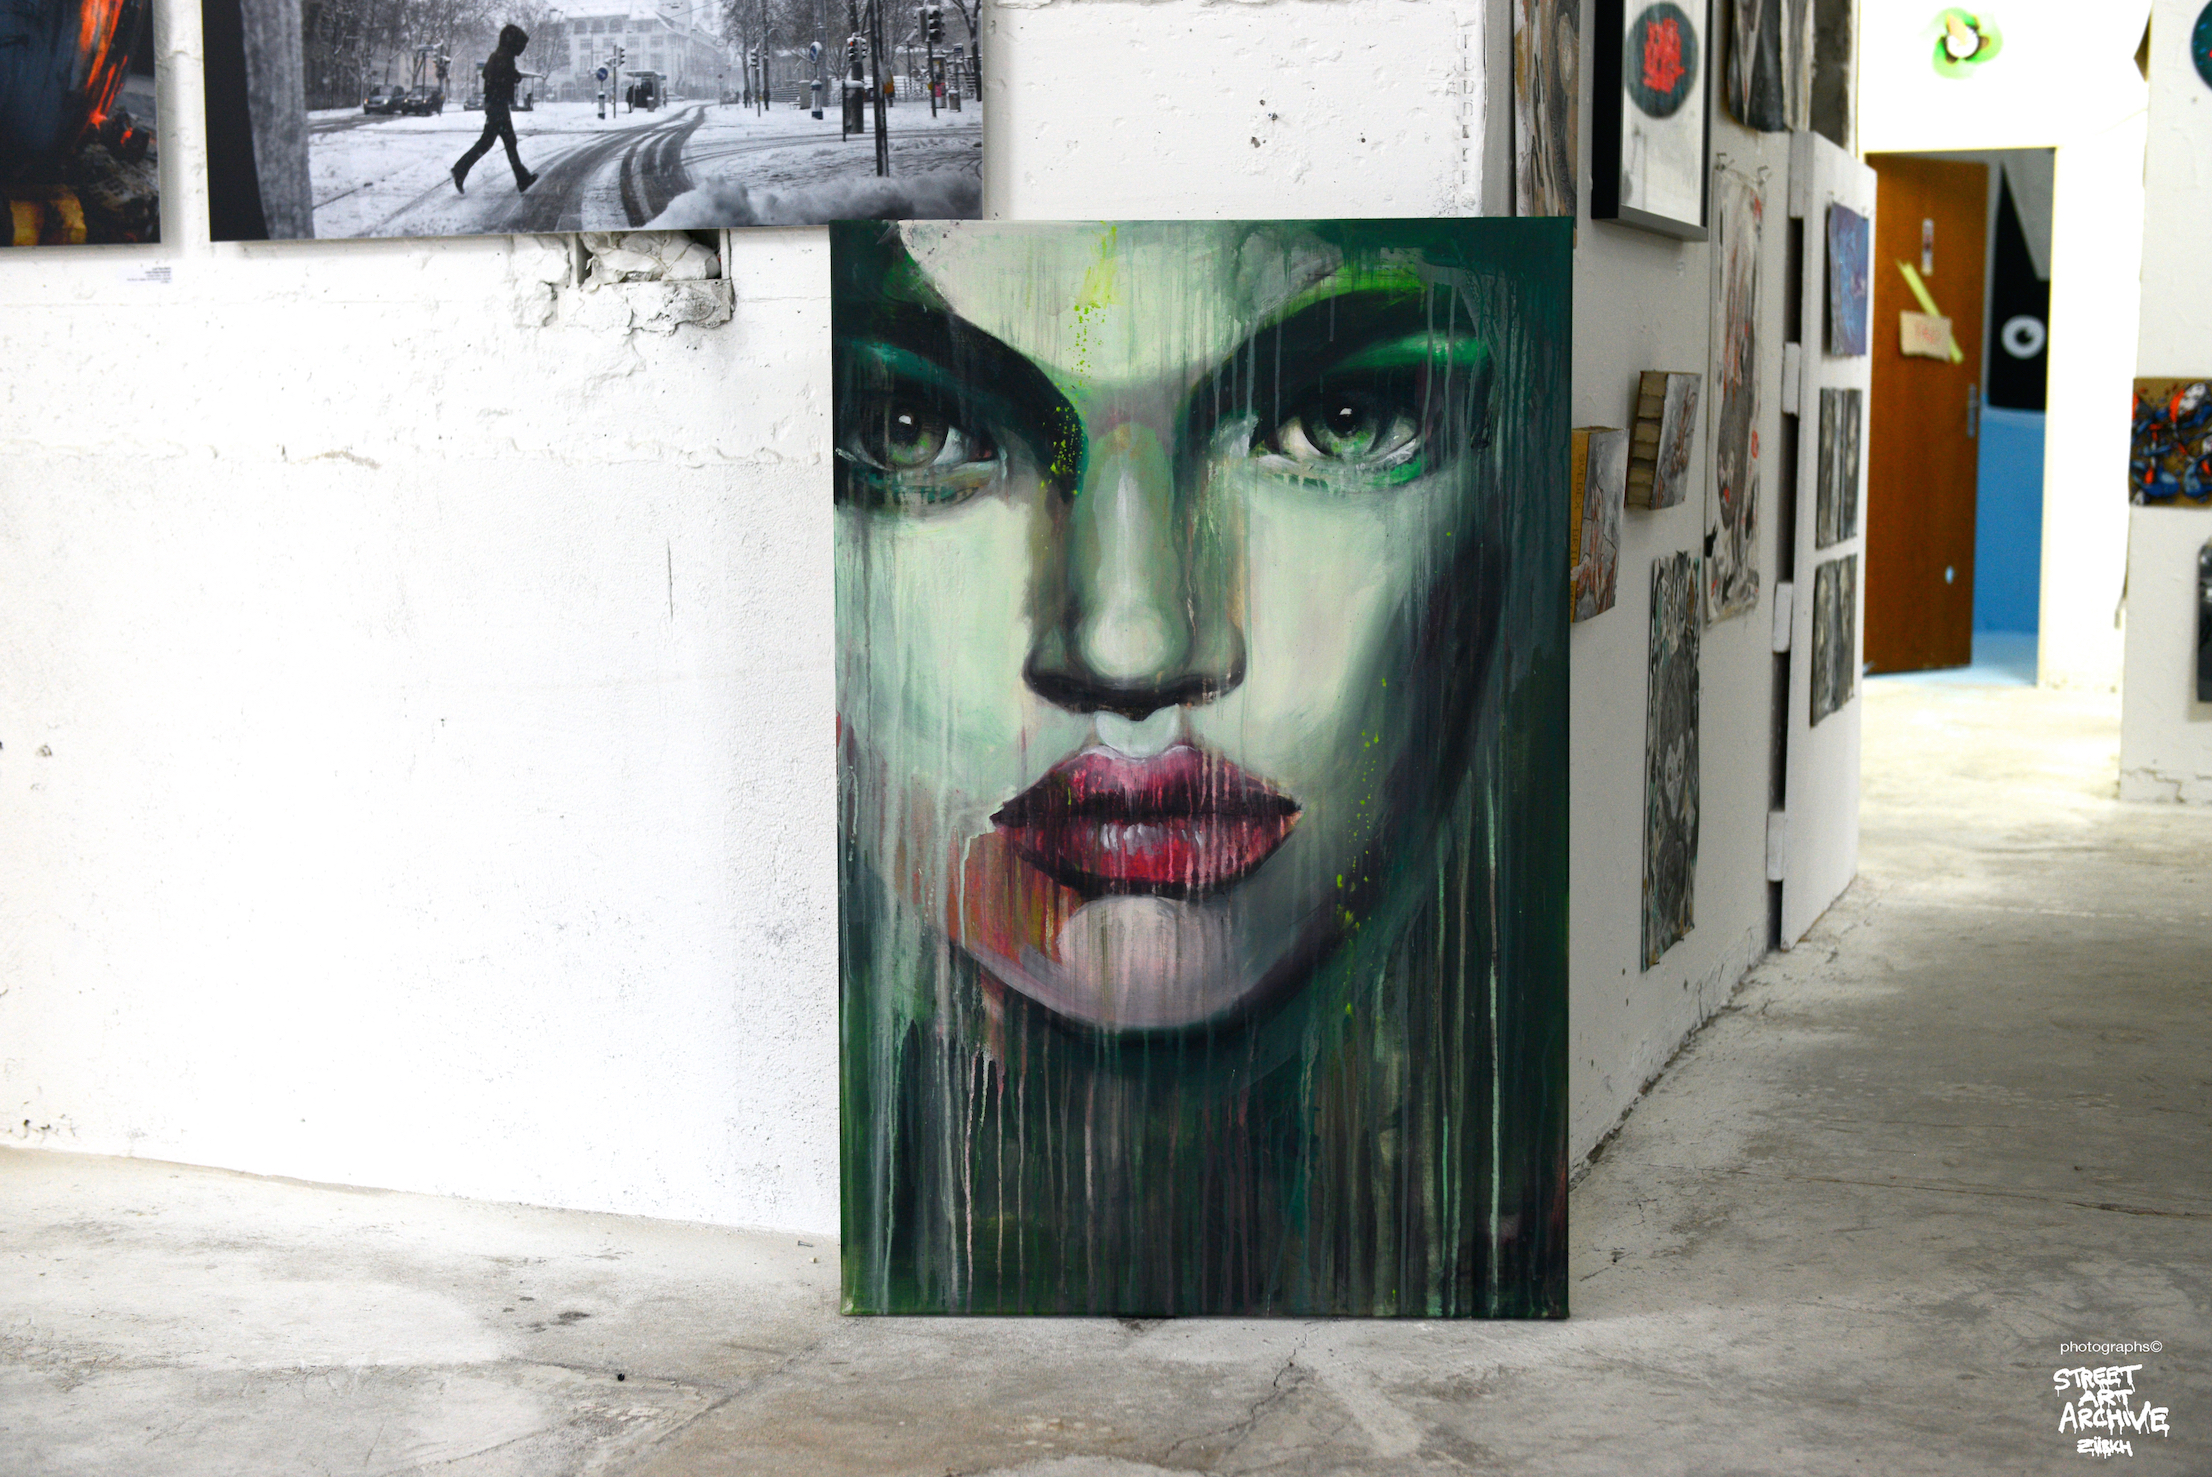 DARIO DE SIENA | Streetart.limited